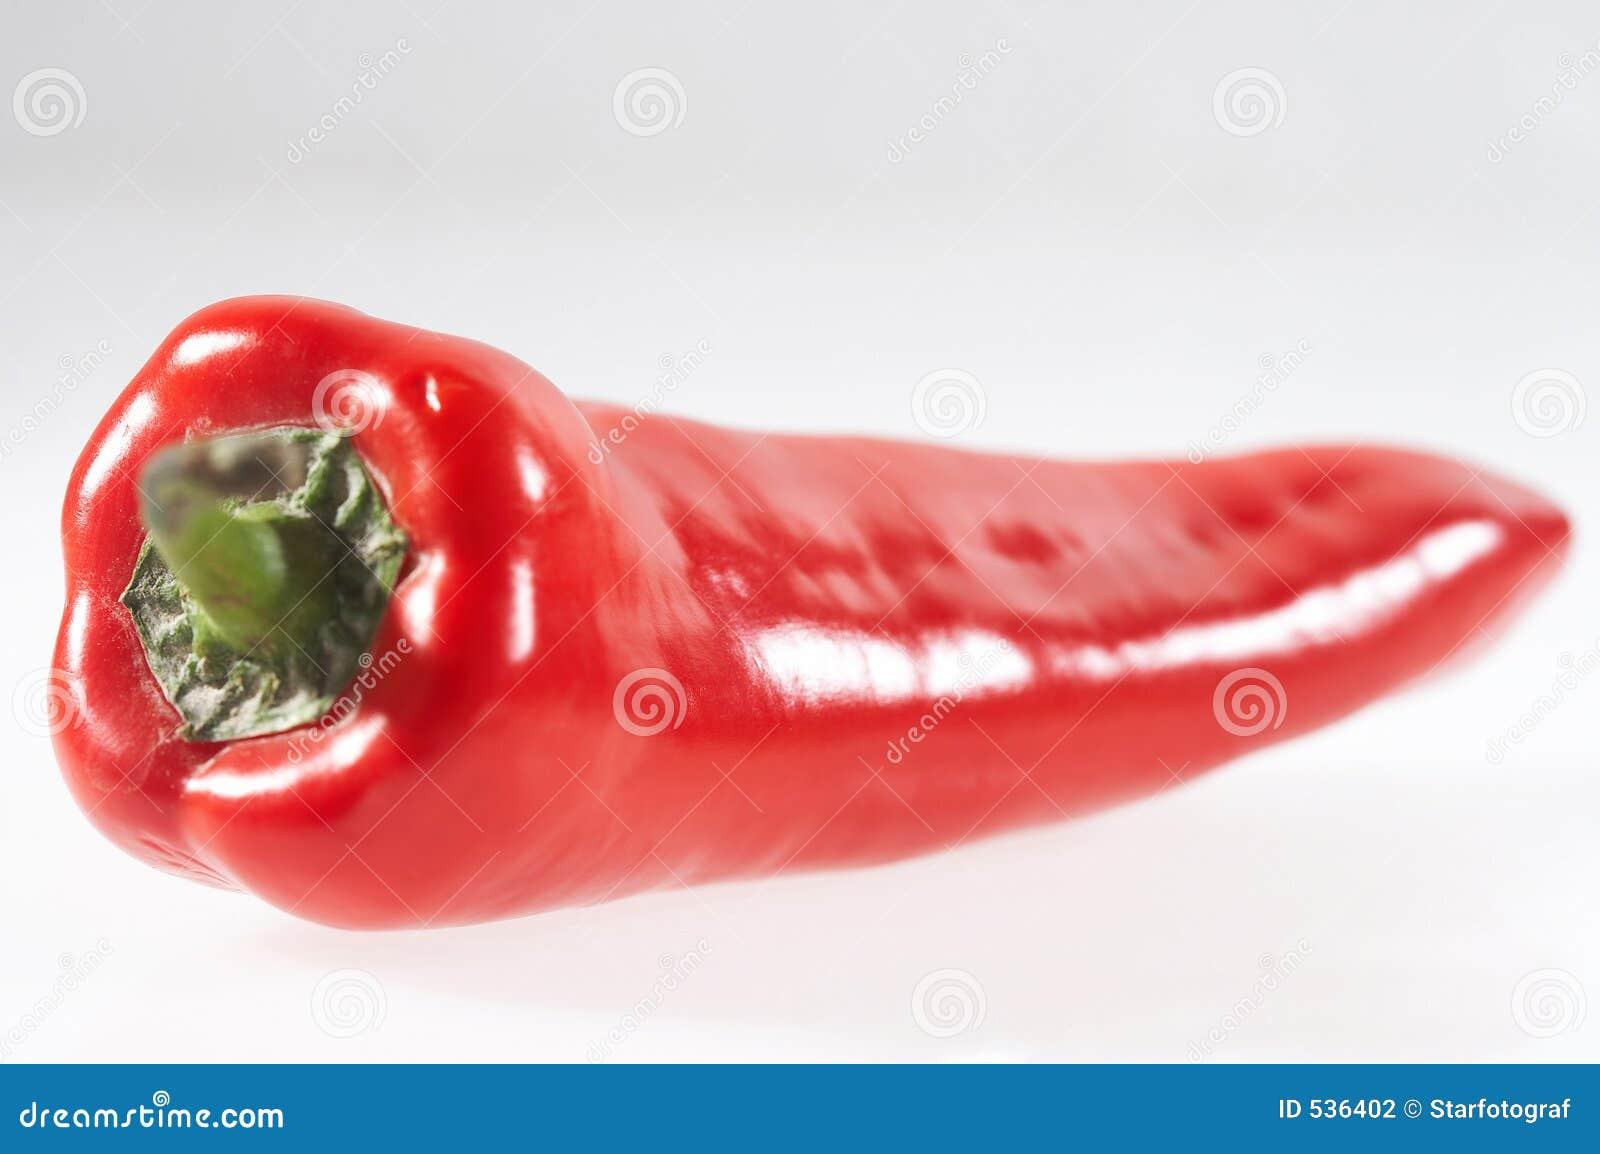 Pimenta - paprika